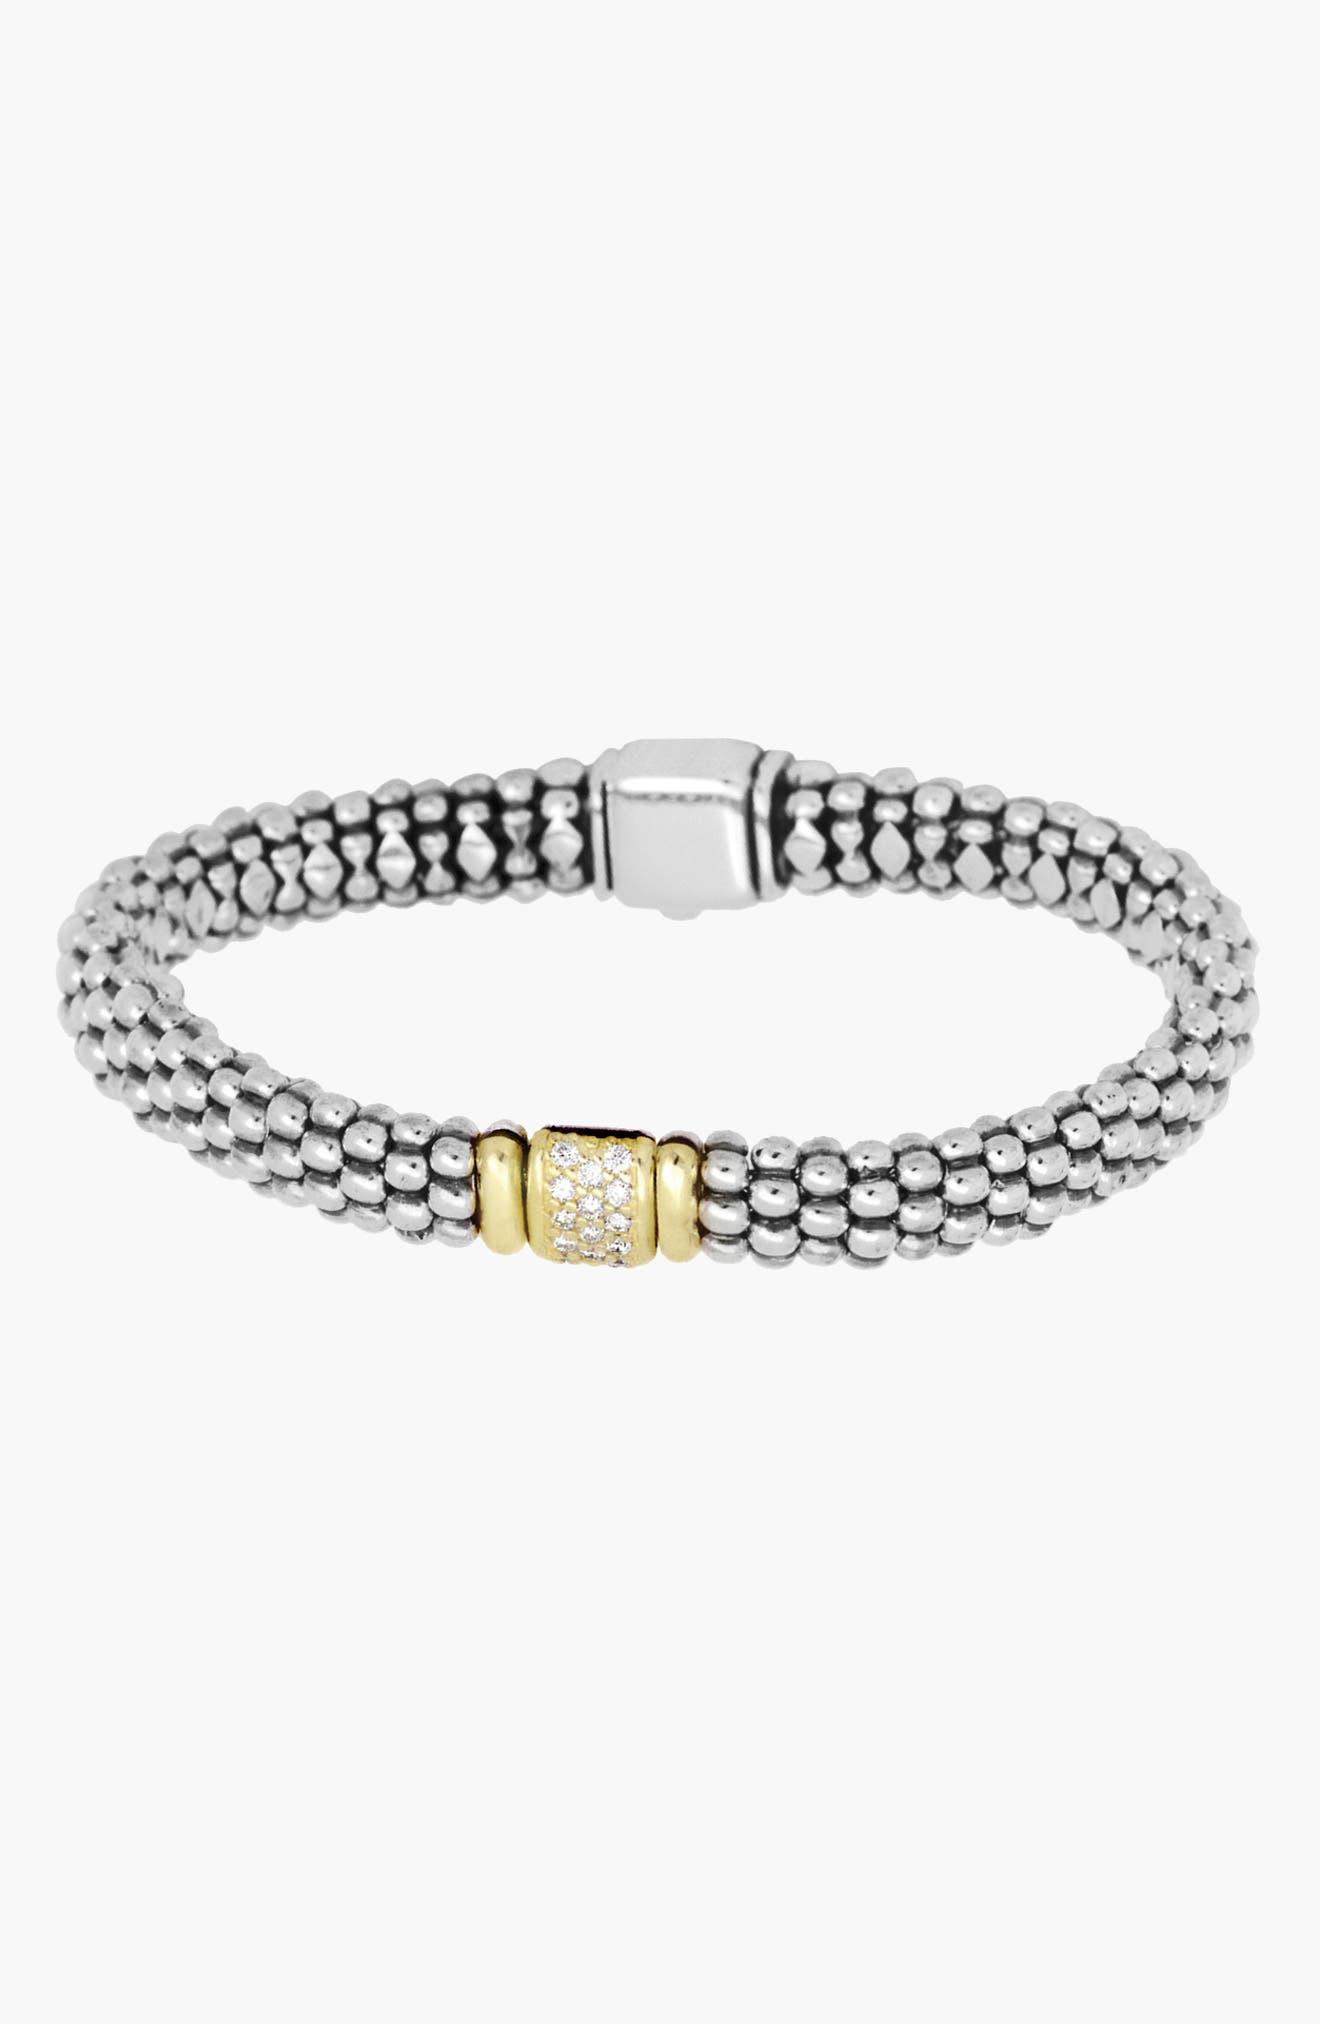 Caviar & Diamond Bracelet,                             Alternate thumbnail 4, color,                             STERLING SILVER/ GOLD